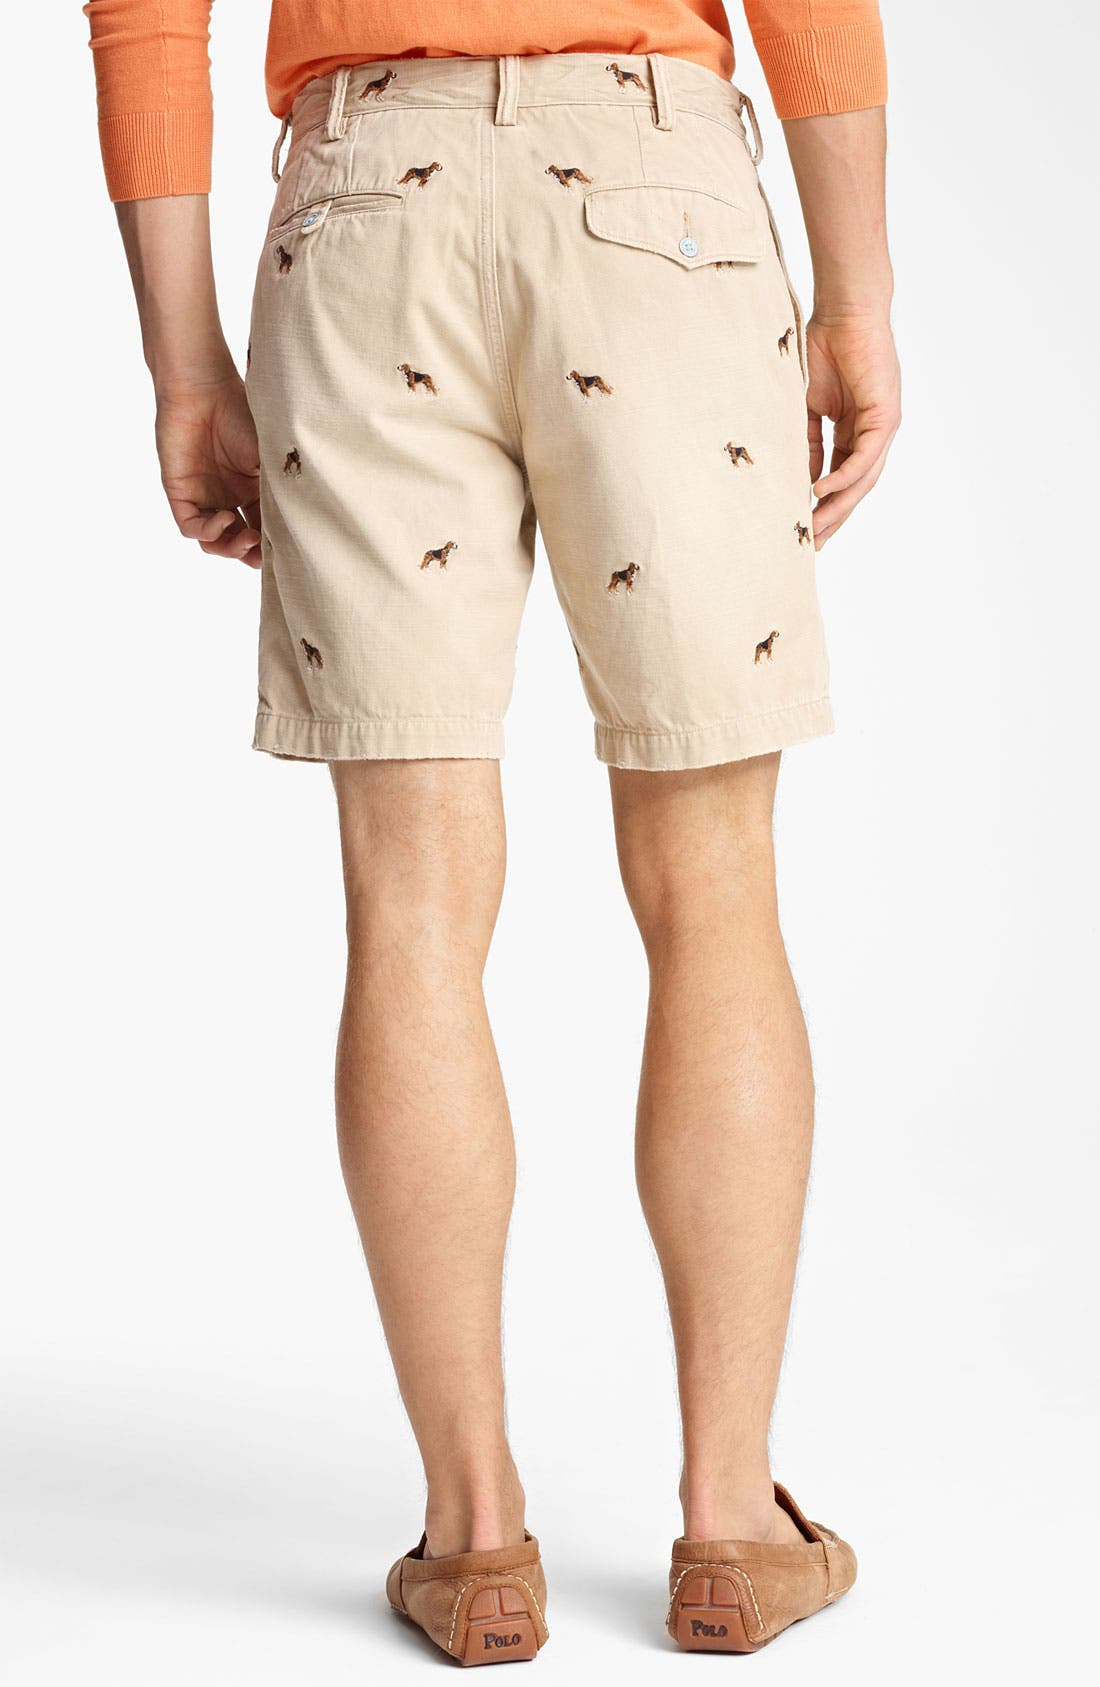 Alternate Image 2  - Polo Ralph Lauren 'Maritime Beagle' Chino Shorts